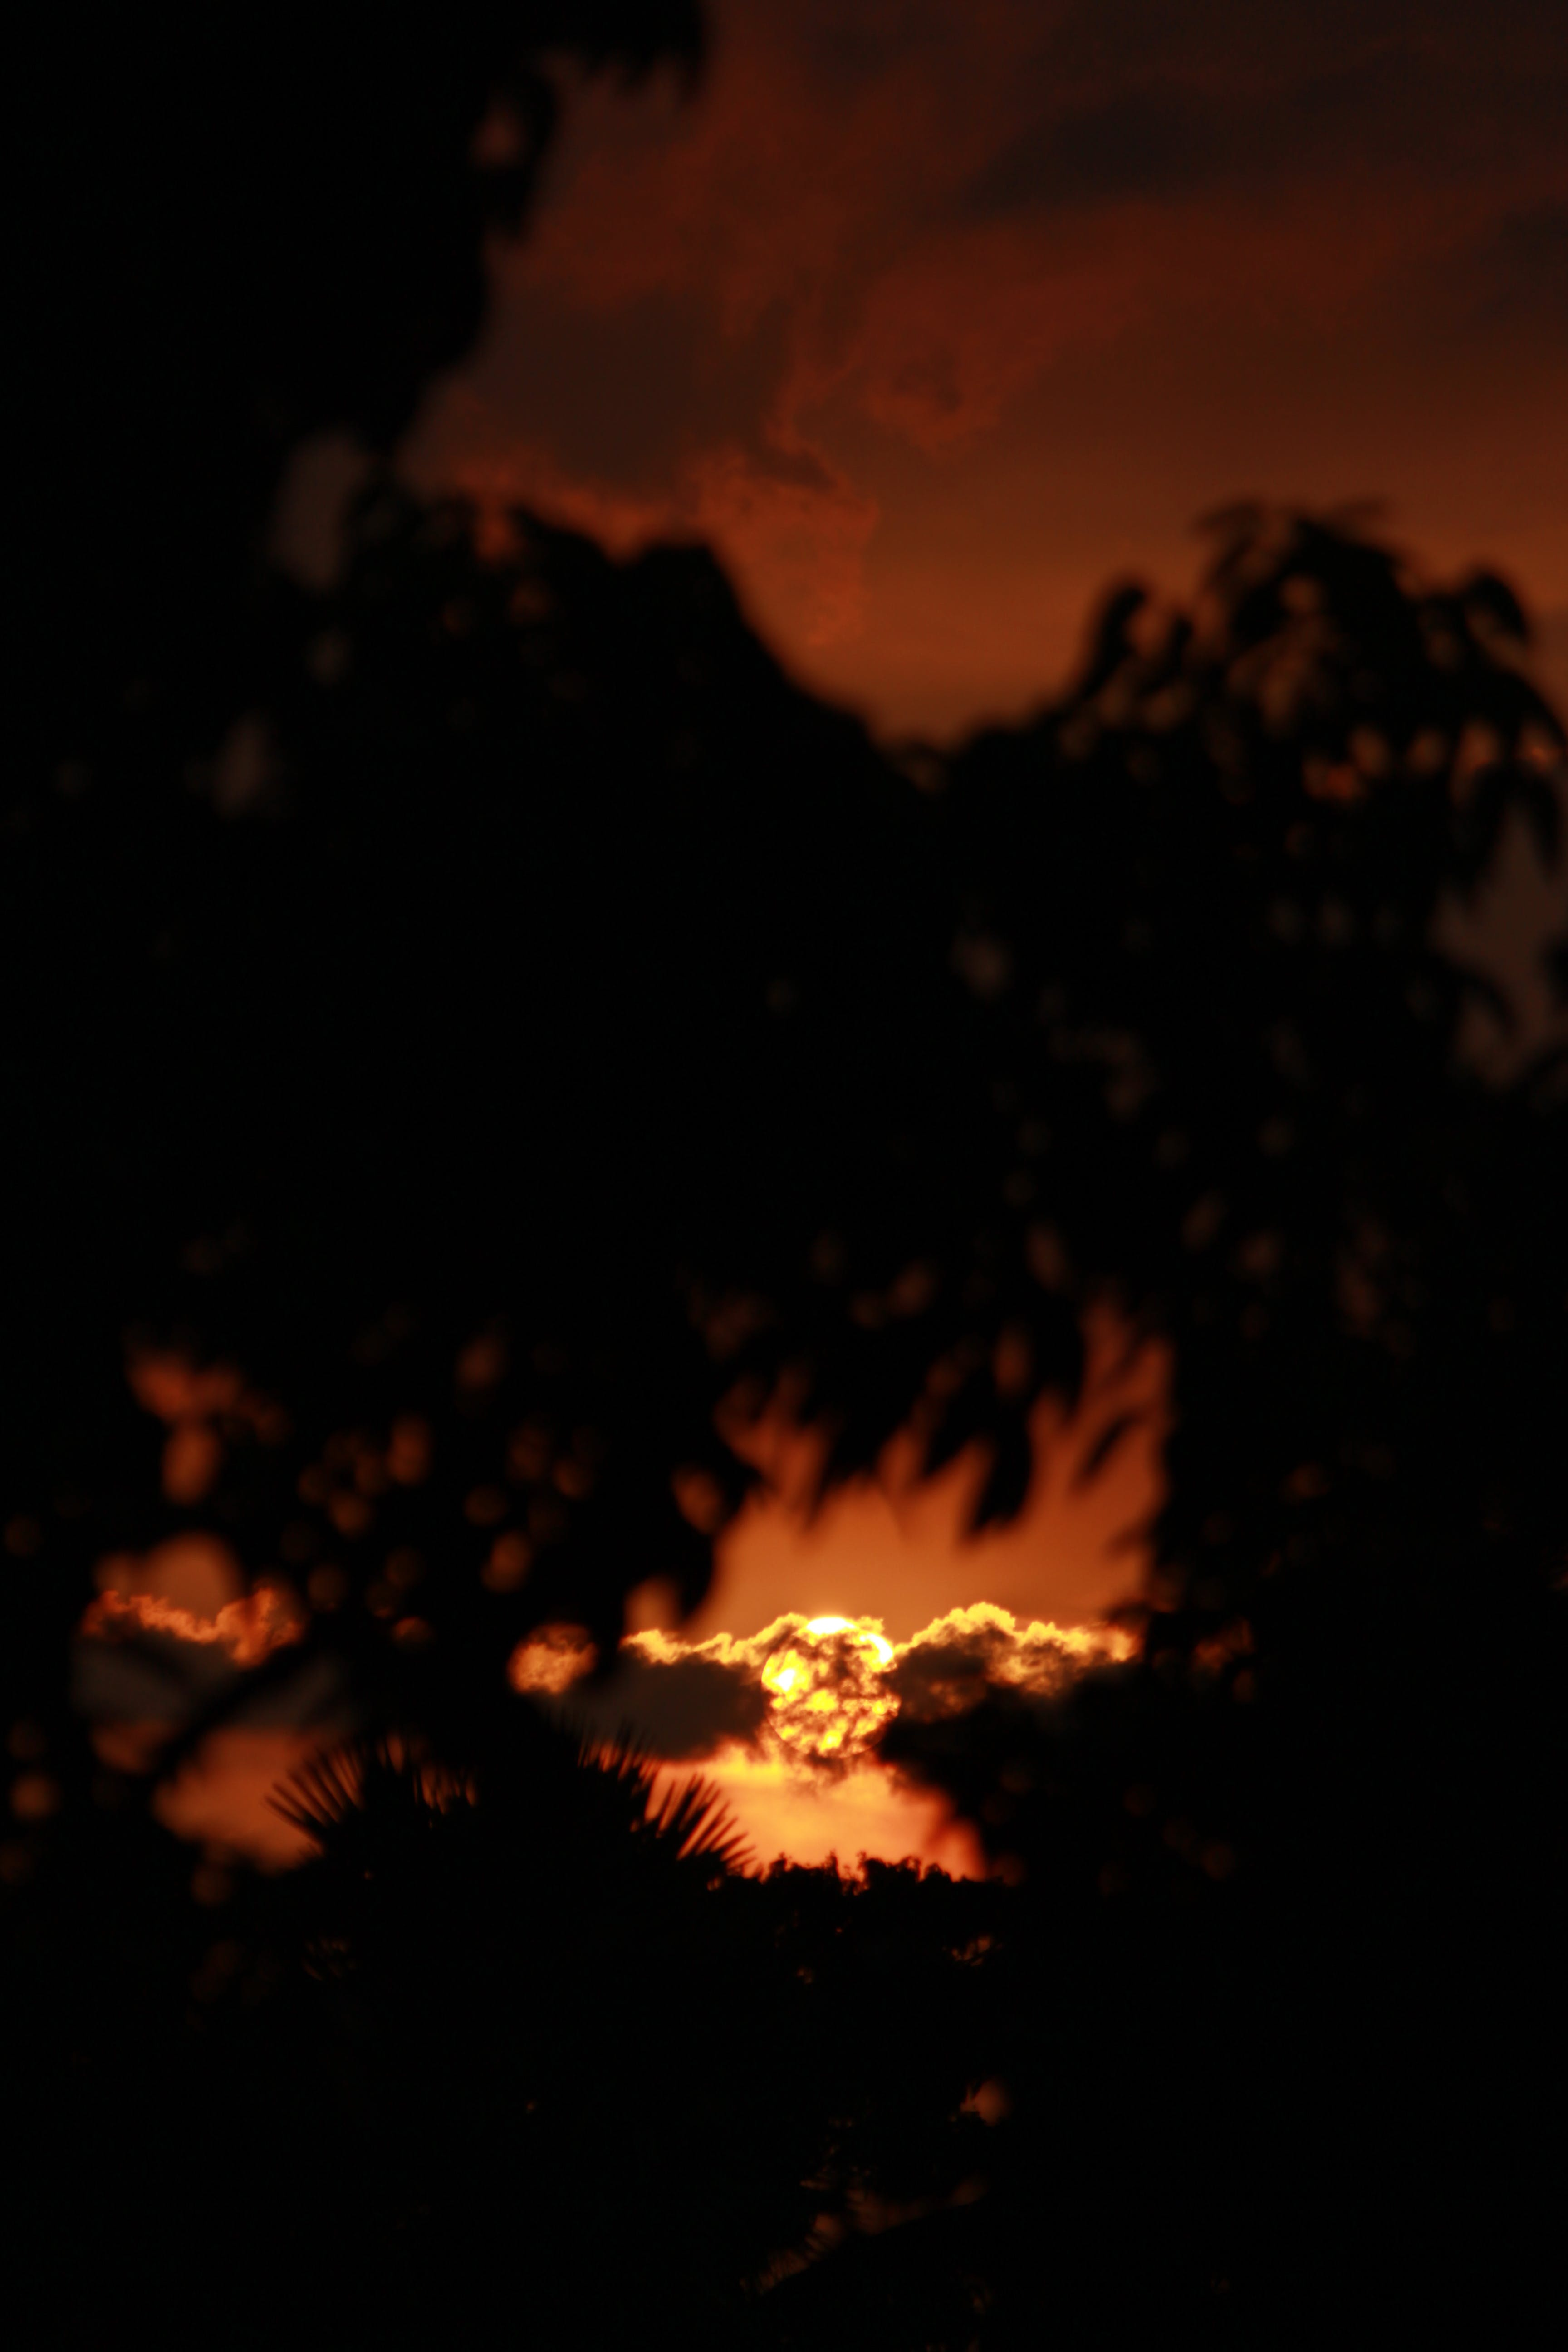 backlit, clouds, dark